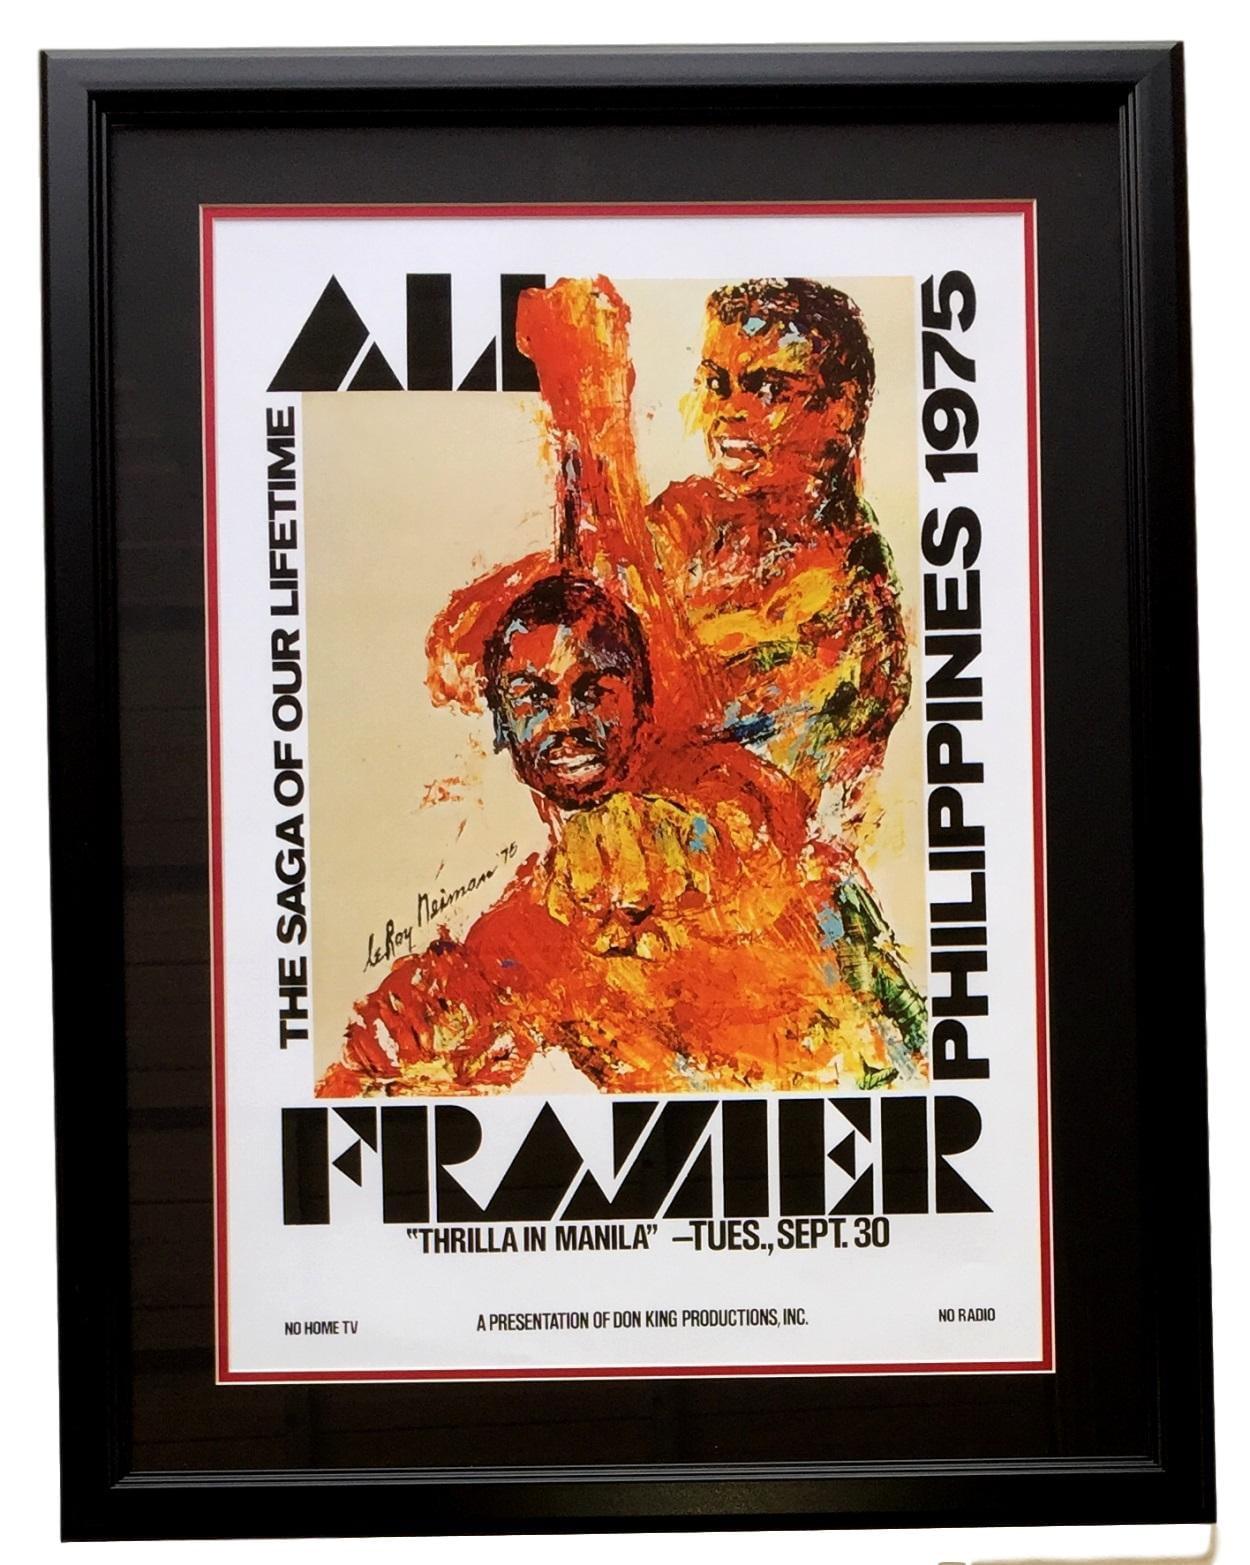 MUHAMMAD ALI JOE FRAZIER CANVAS PRINT PICTURE WALL ART HOME DECOR FREE DELIVERY